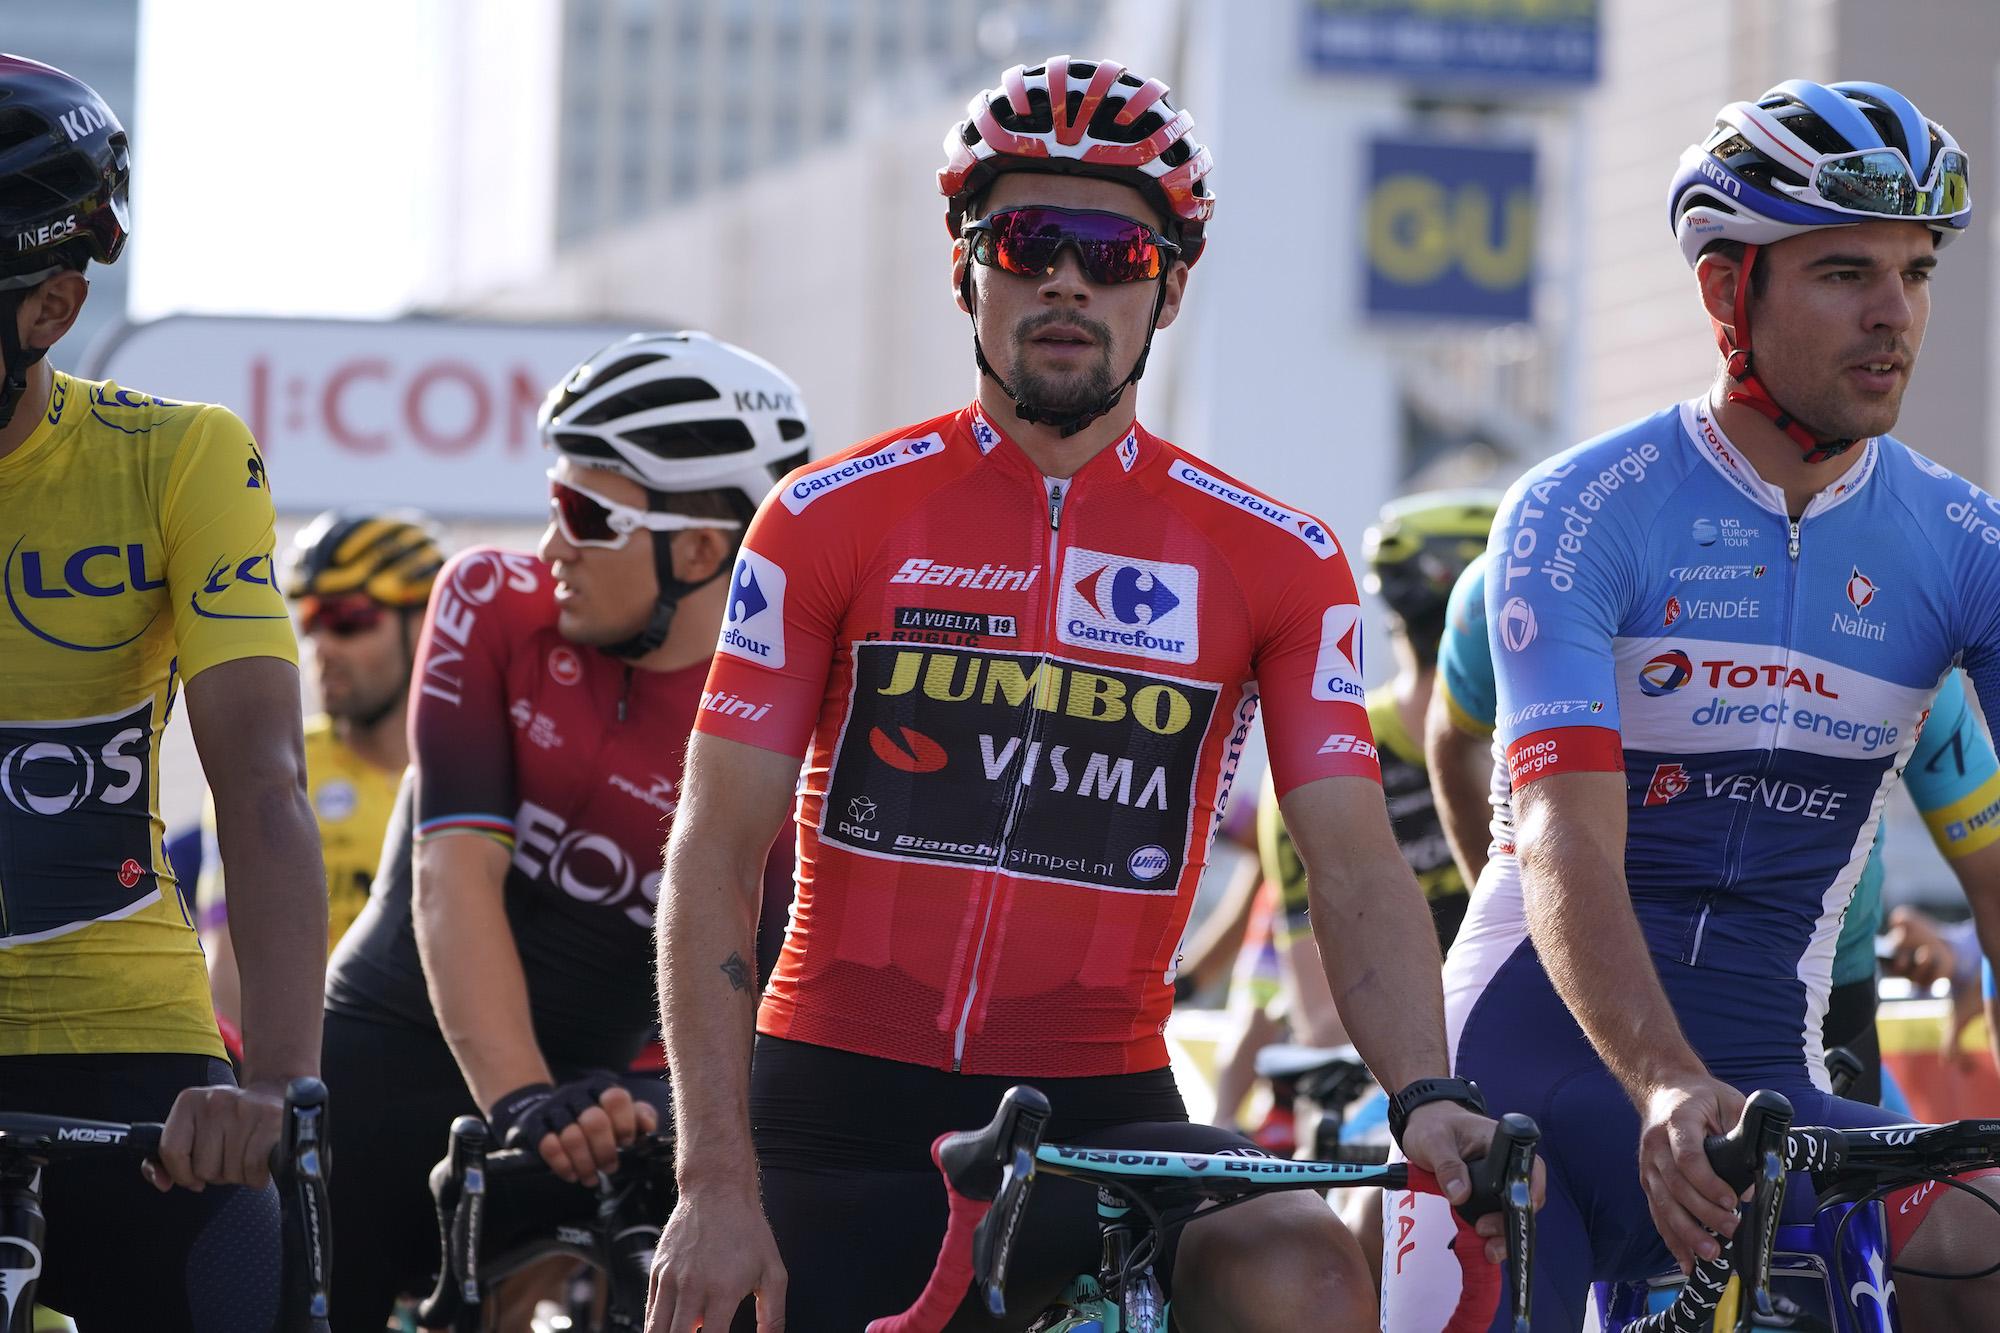 Primož Roglič says he's the big favourite for the Tour de France 2020